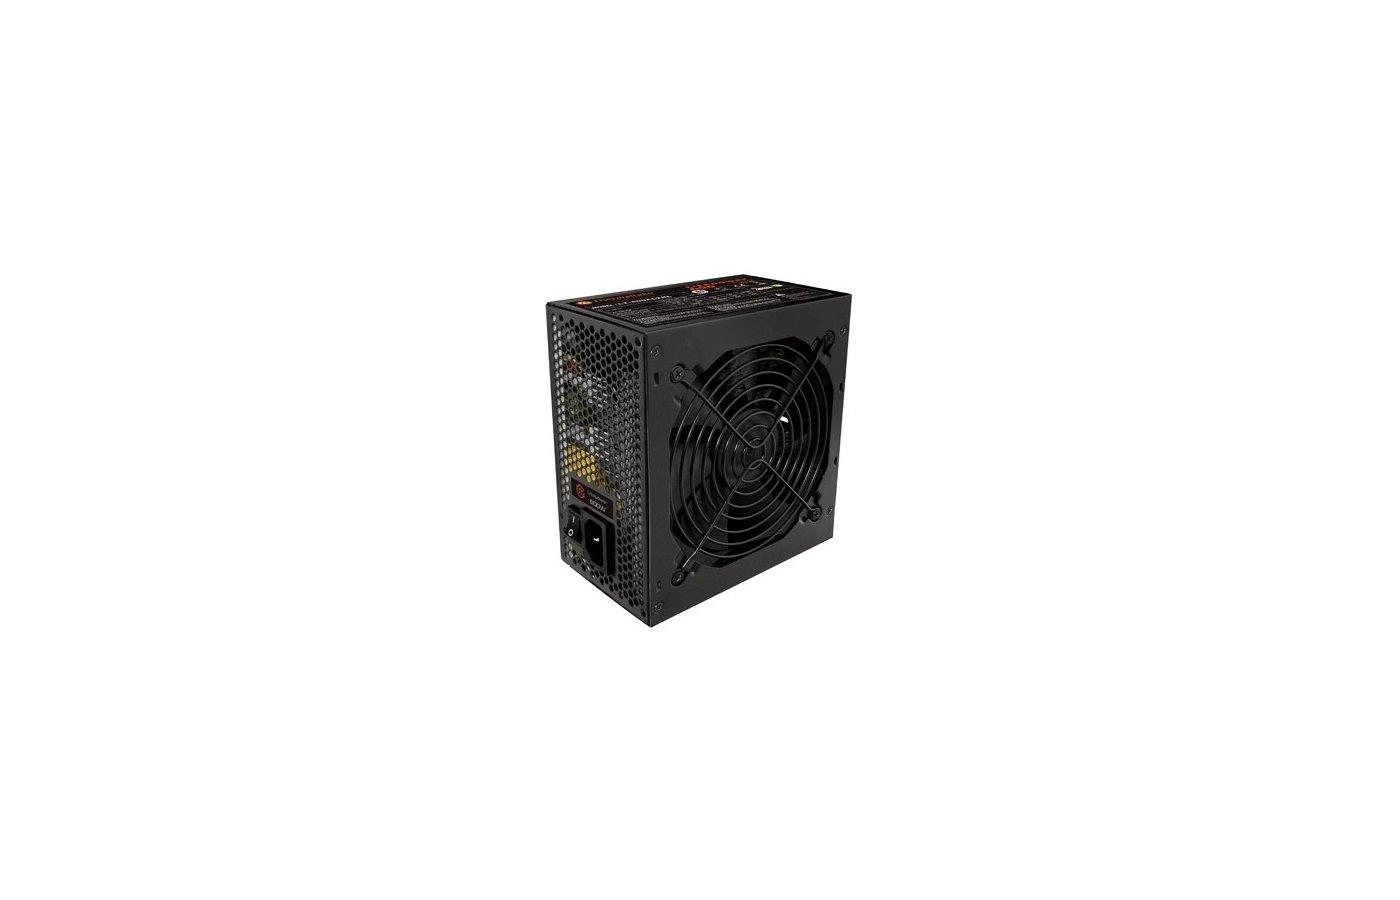 Блок питания Thermaltake ATX 650W LT-650P (24+4+4pin) APFC 120mm fan 5xSATA RTL